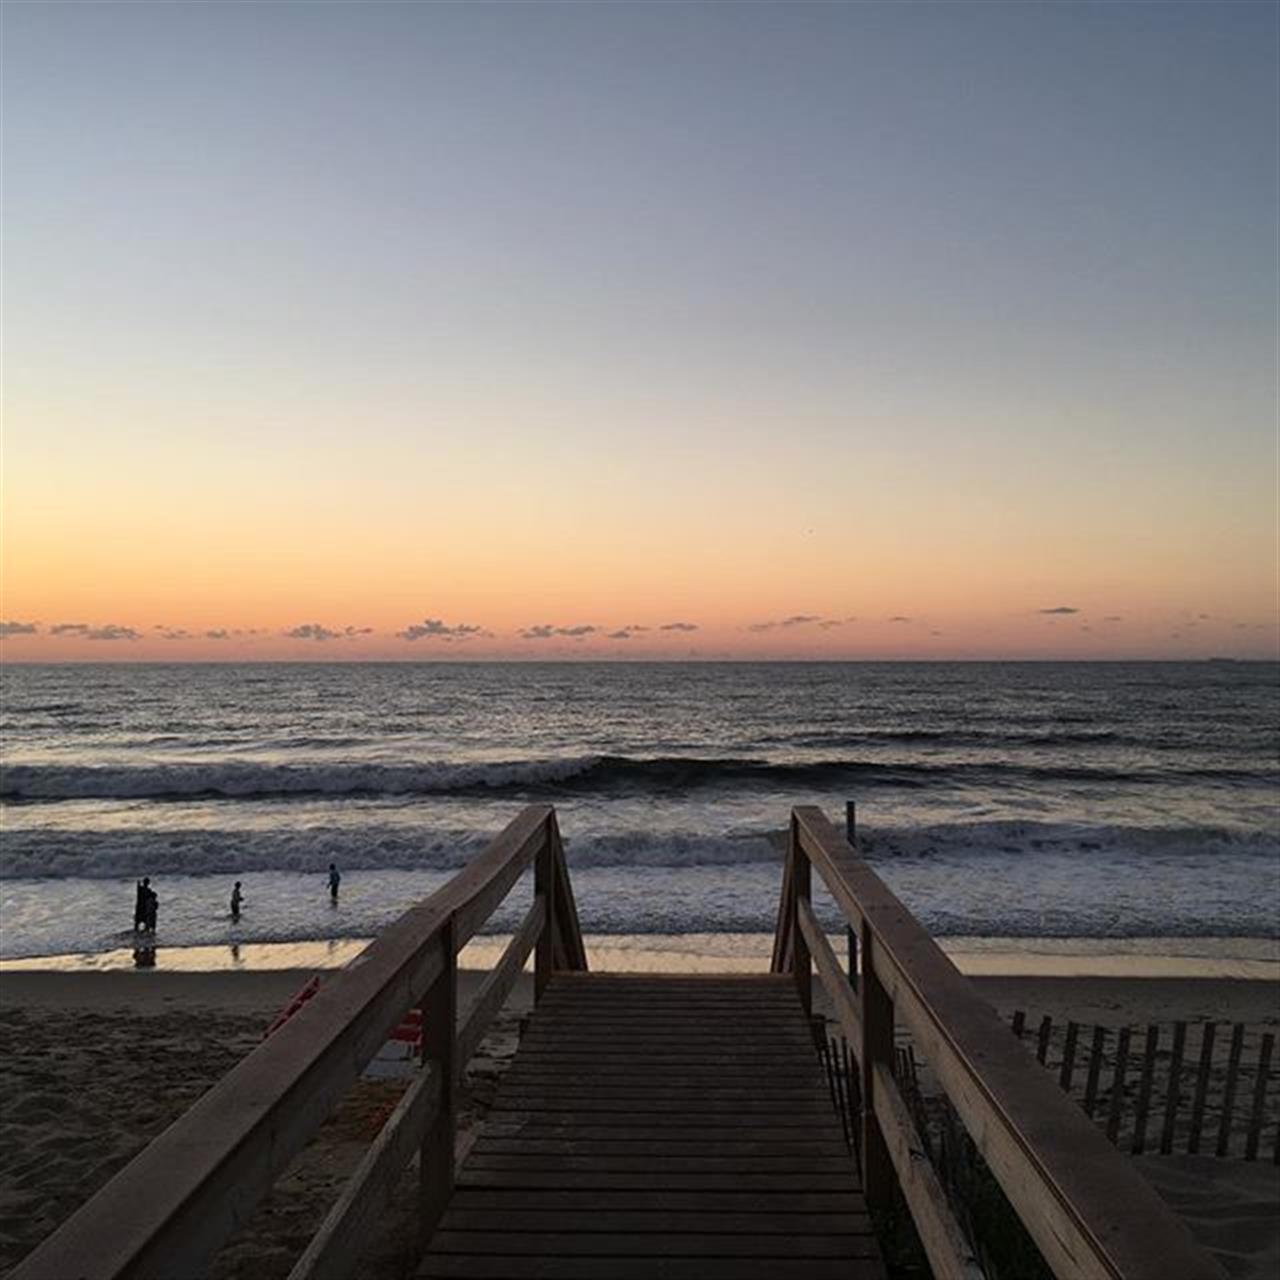 Good morning! #nj #beach #newjersey #sunrise #jshn